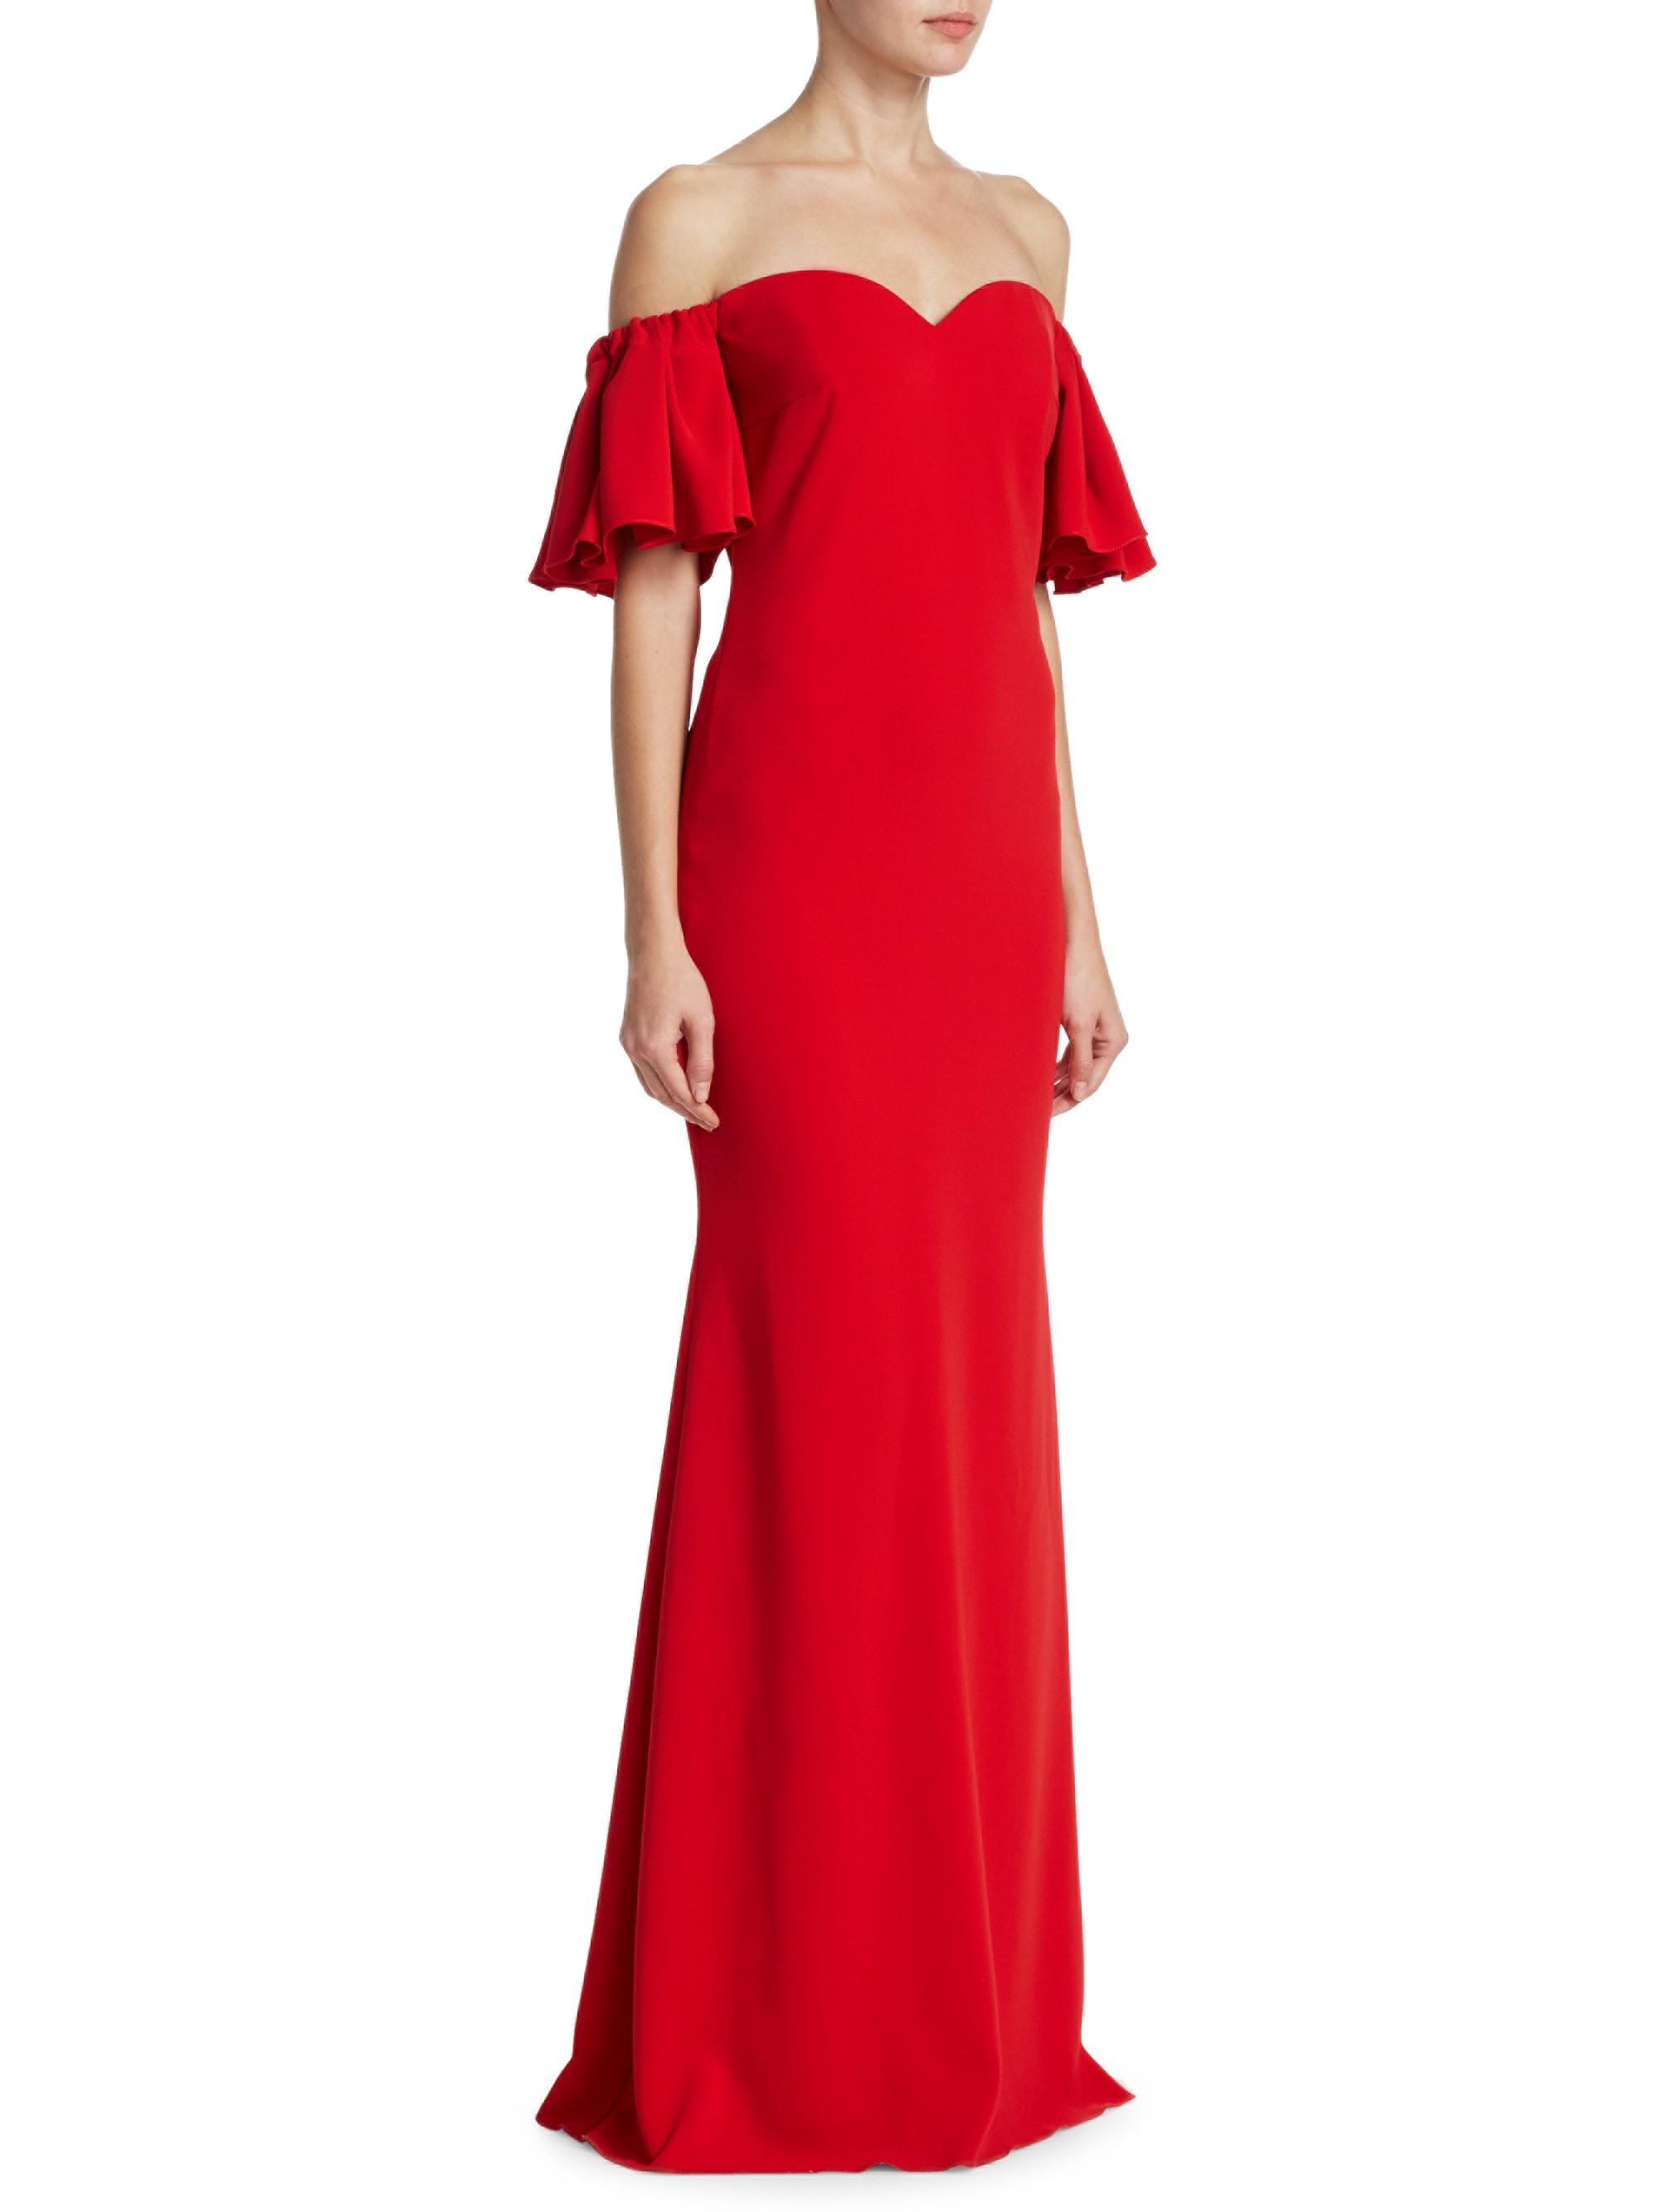 21++ Badgley mischka shoulder bow dress ideas